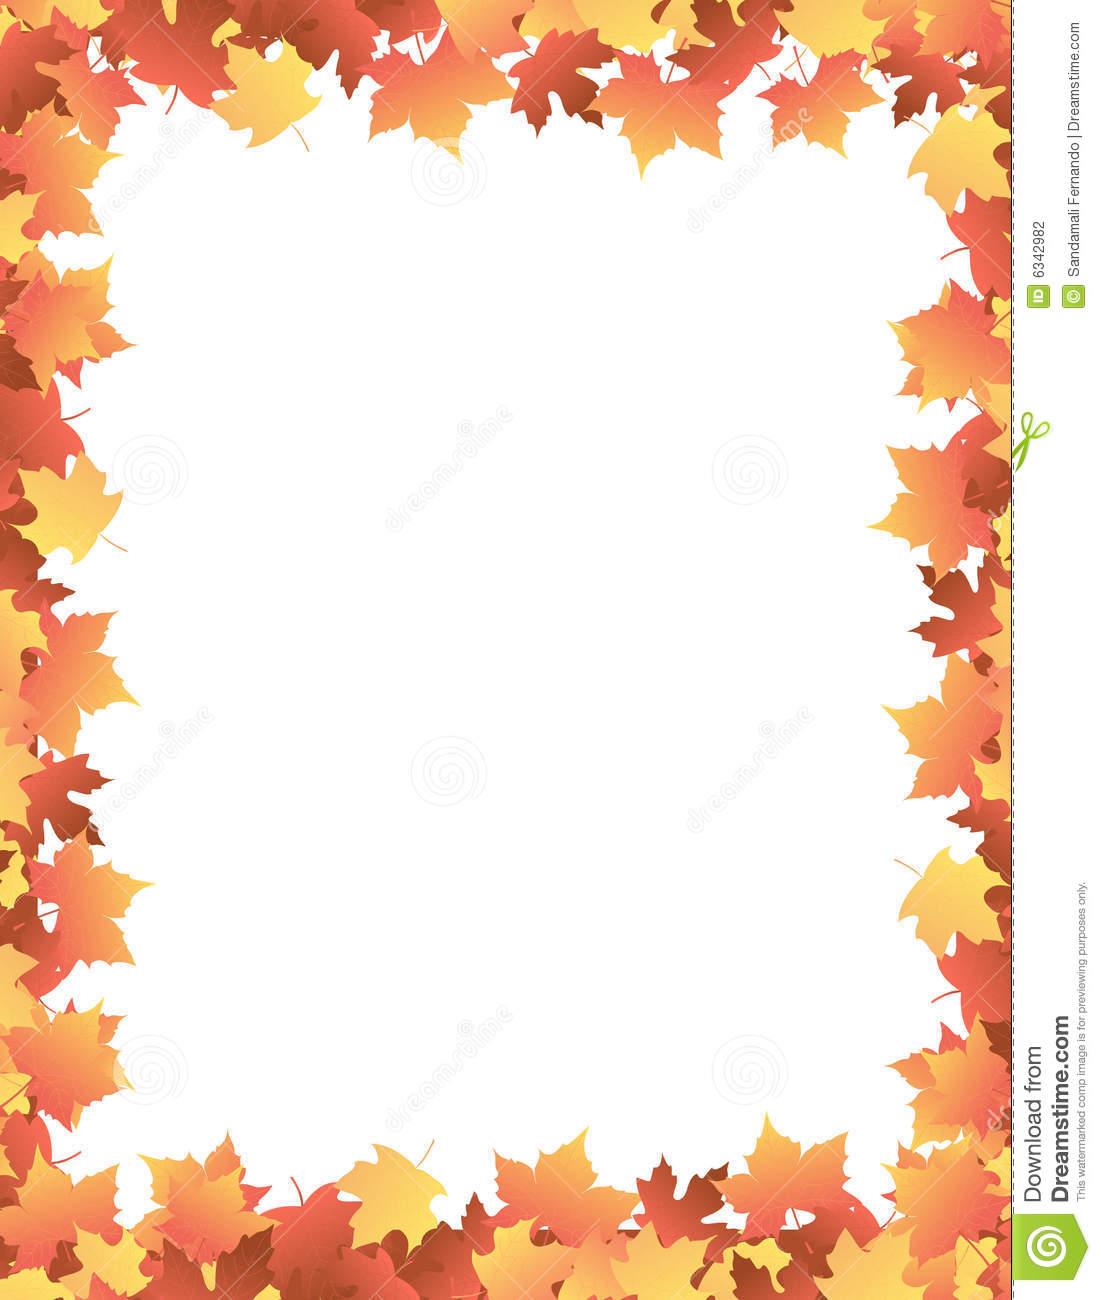 Fall Leaves Clip Art Border Recipe 101-Fall Leaves Clip Art Border Recipe 101-14